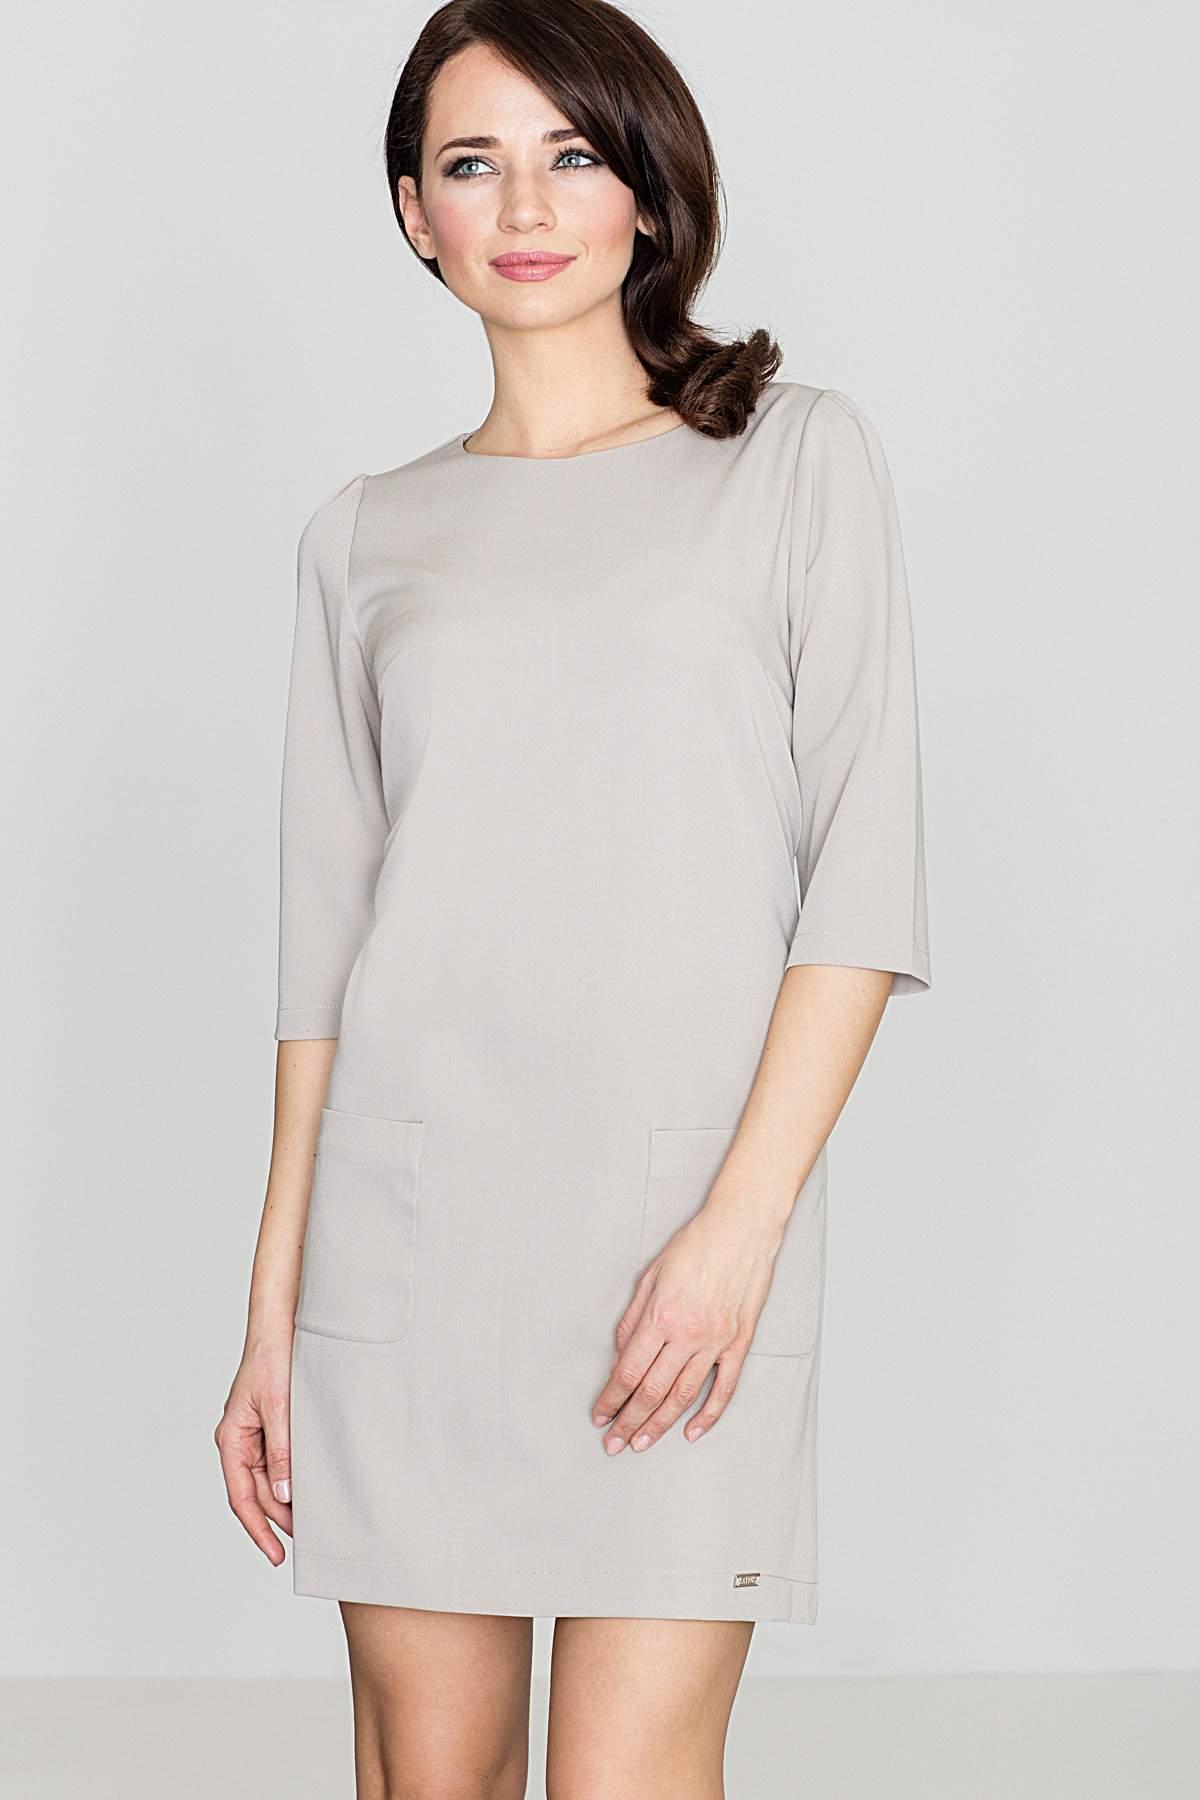 1cb711f99316 KATRUS κομψο μινι φορεμα